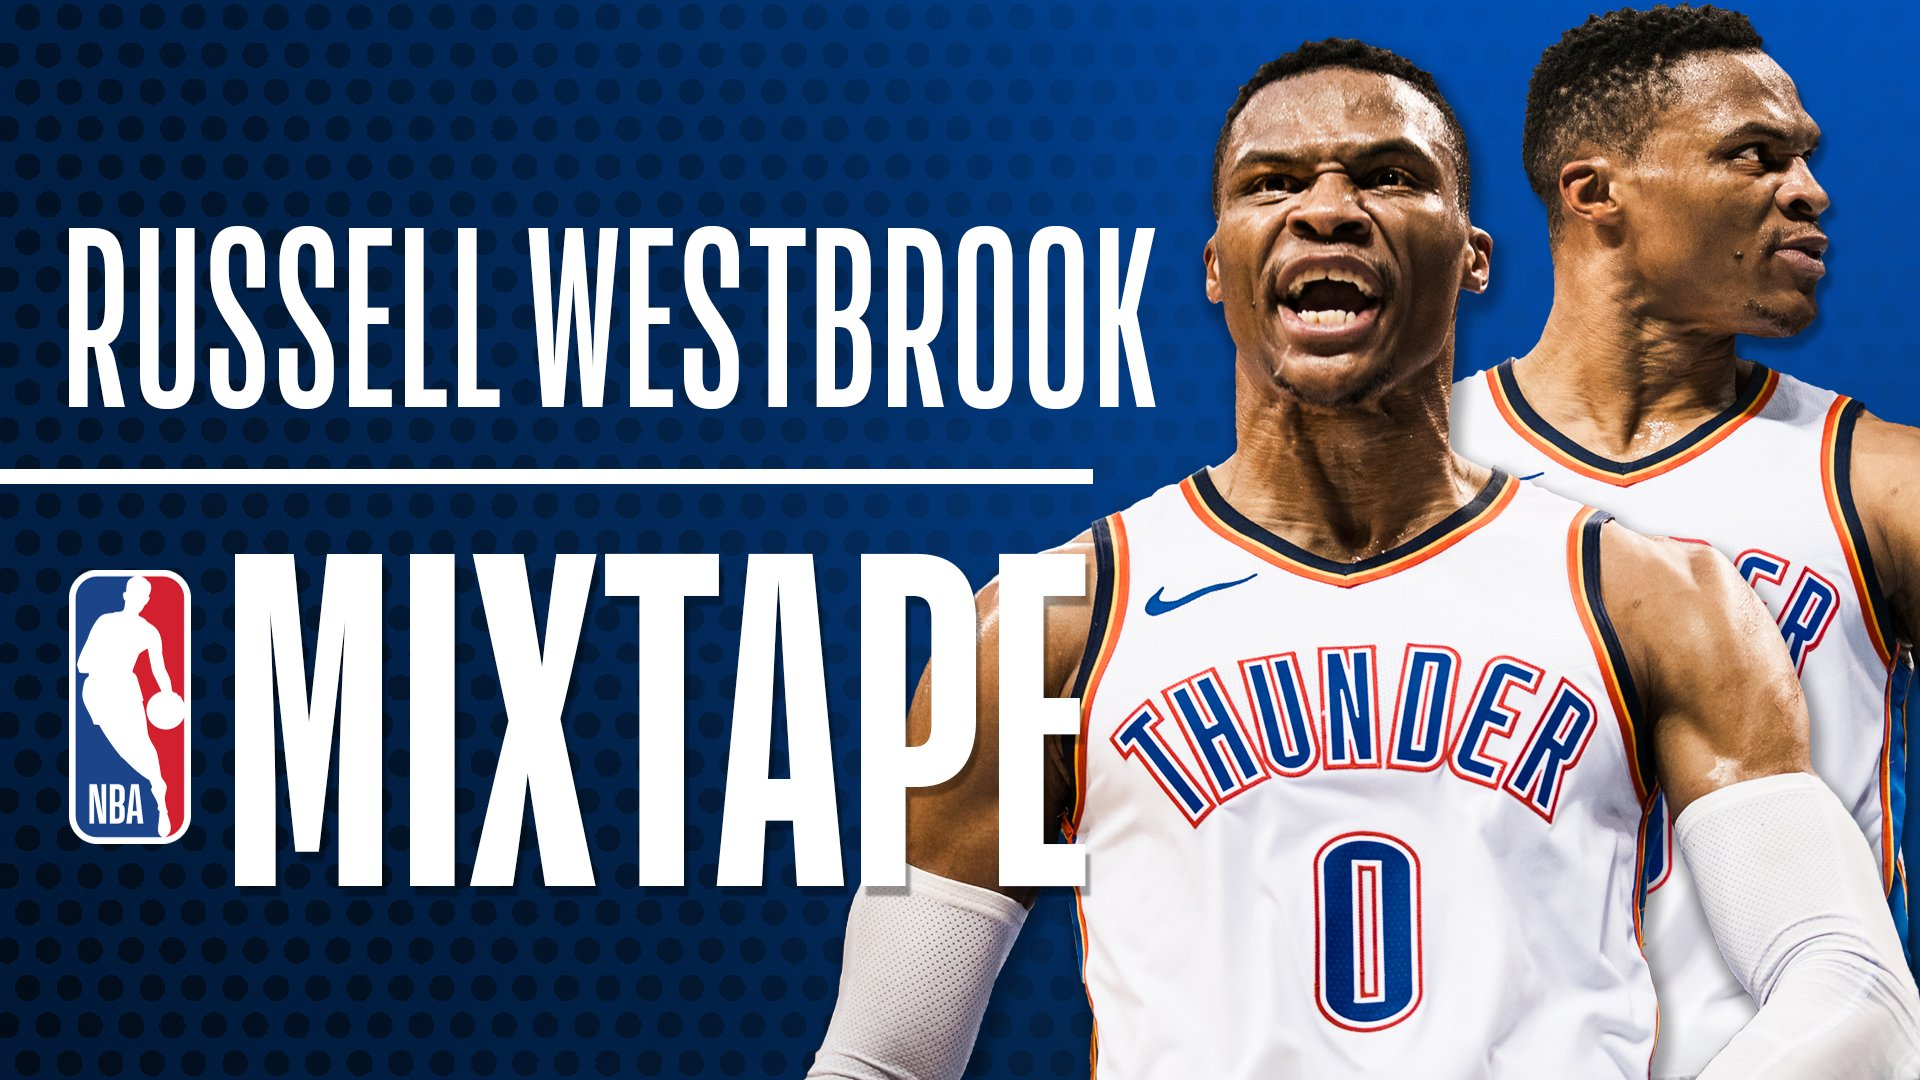 """Nuclear athleticism!!""  @russwest44's 2018 #NBAMixtape! #MixtapeMonday https://t.co/yU6G0ZqP4h"